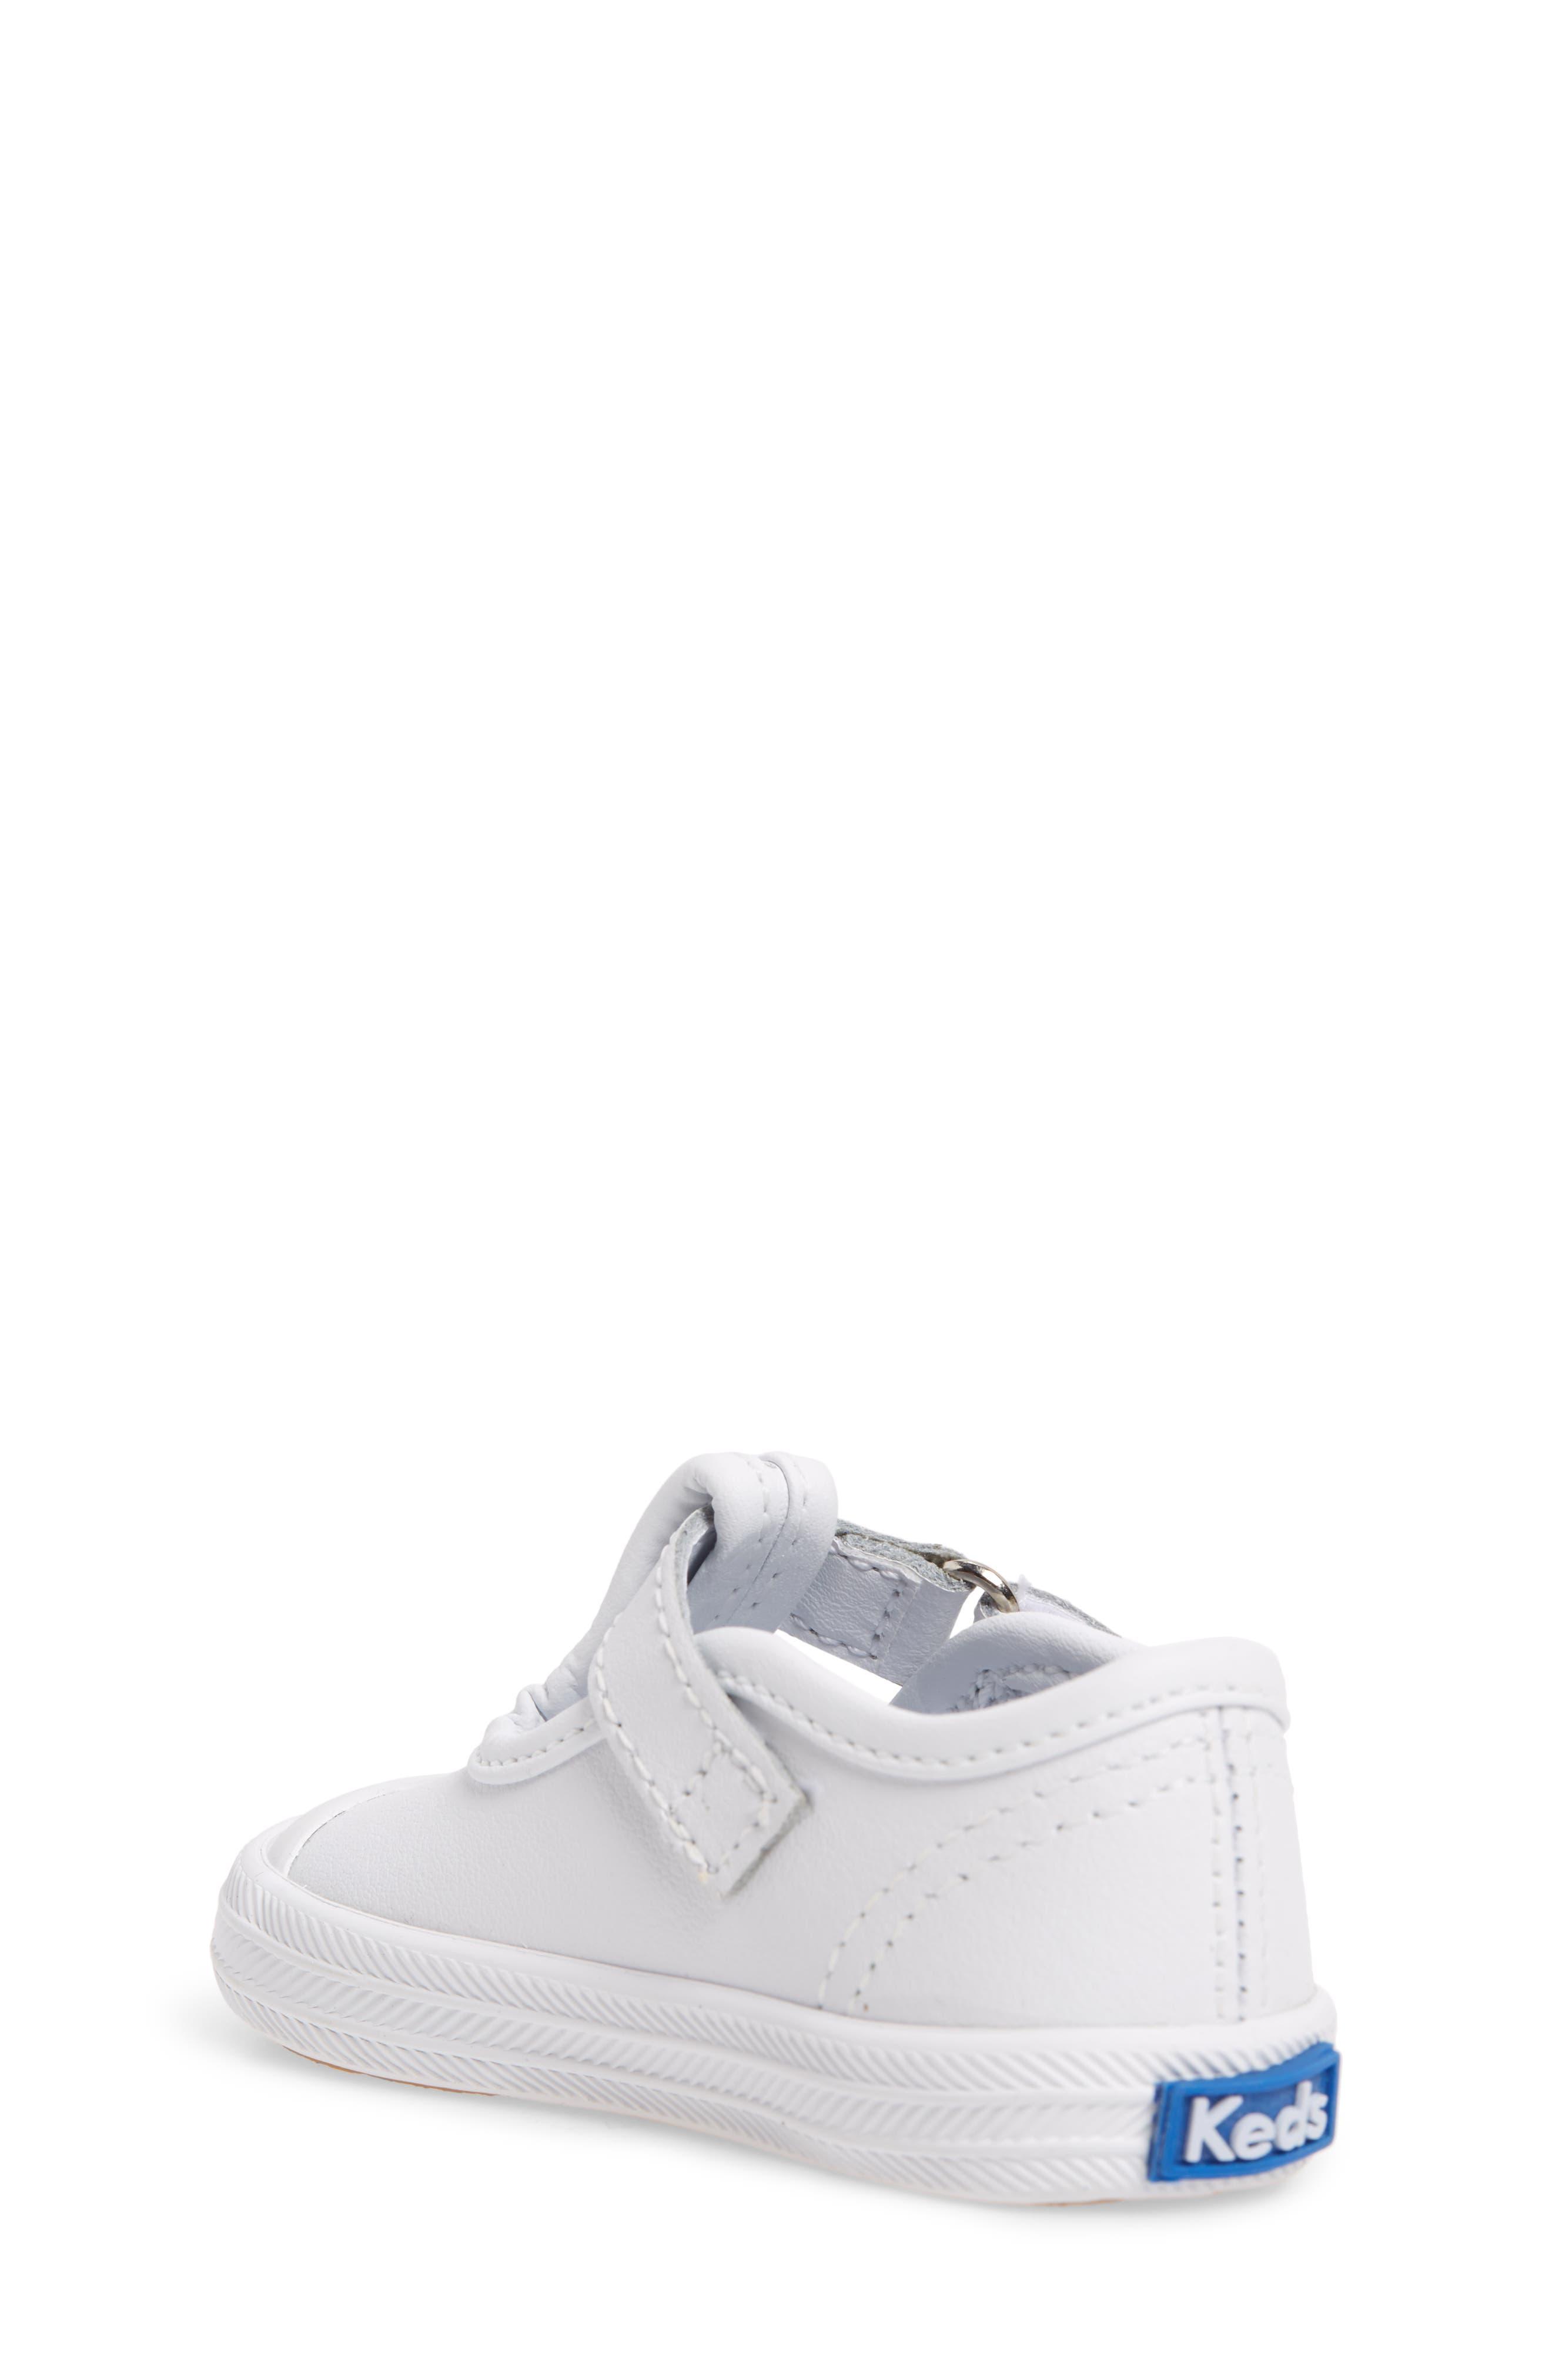 KEDS<SUP>®</SUP>, 'Champion' T-Strap Shoe, Alternate thumbnail 2, color, WHITE LEATHER